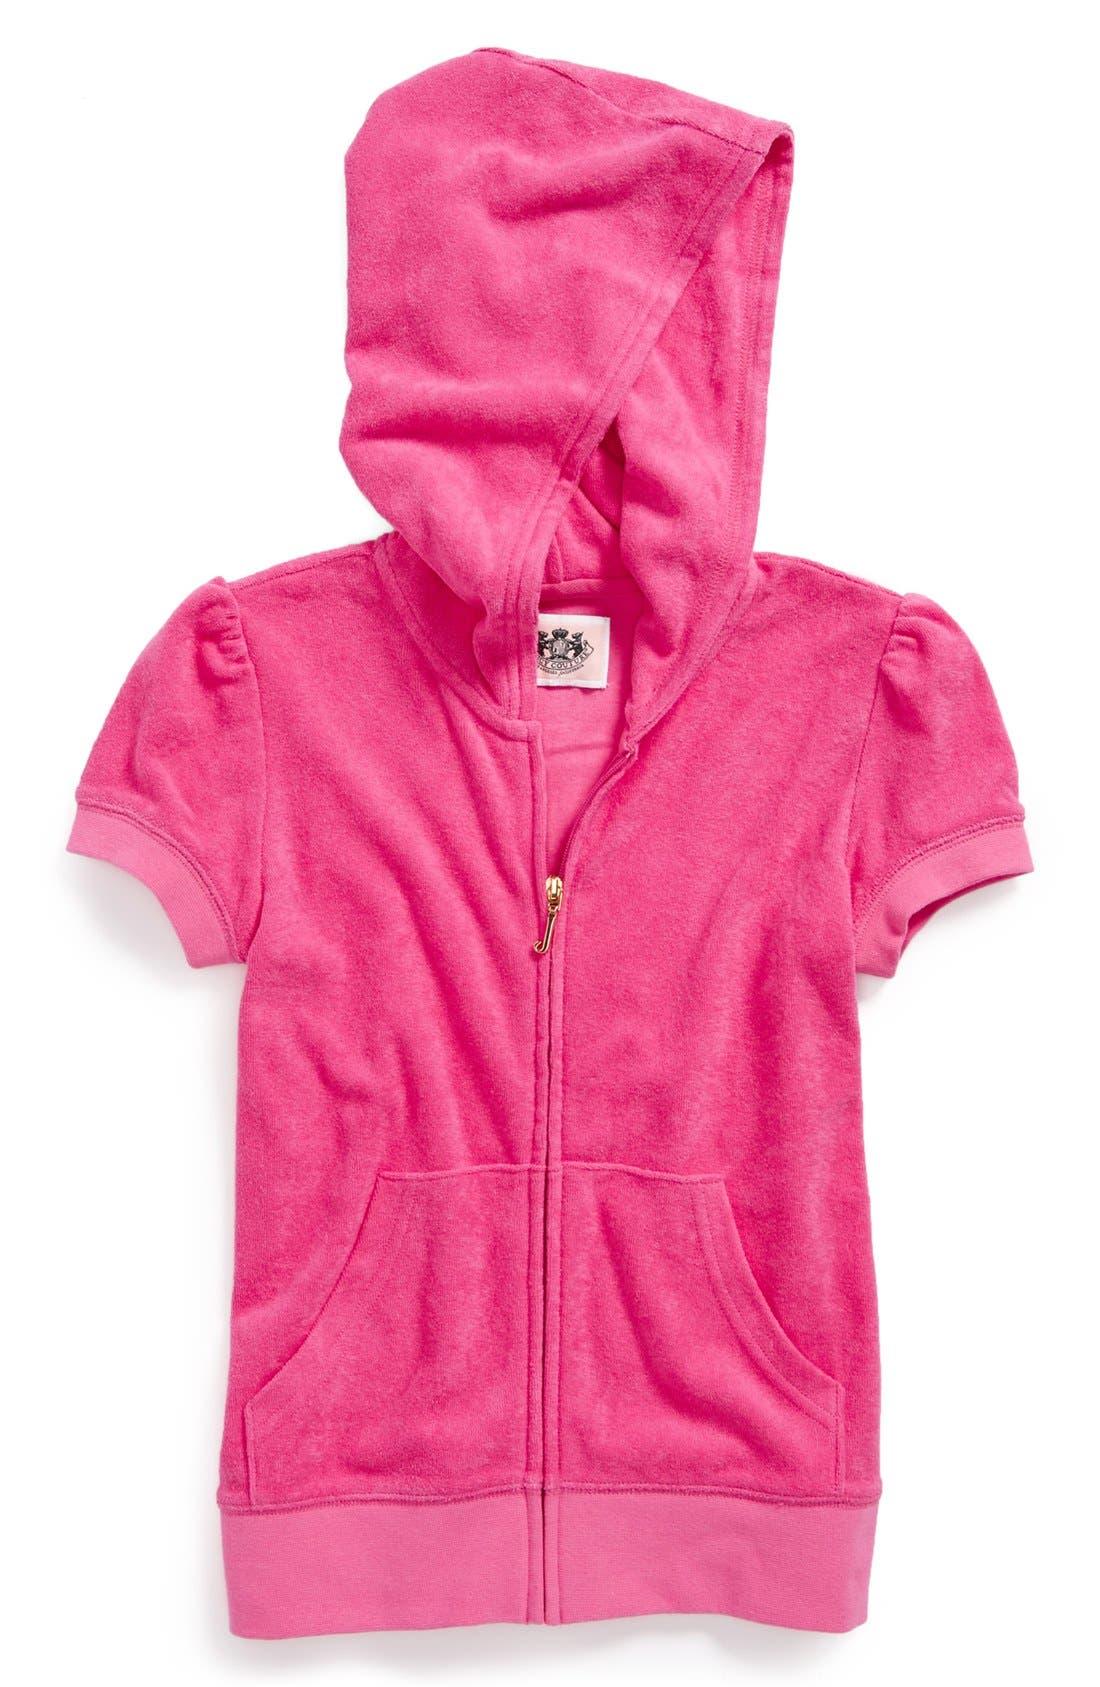 Main Image - Juicy Couture Short Sleeve Hoodie (Toddler Girls, Little Girls & Big Girls)